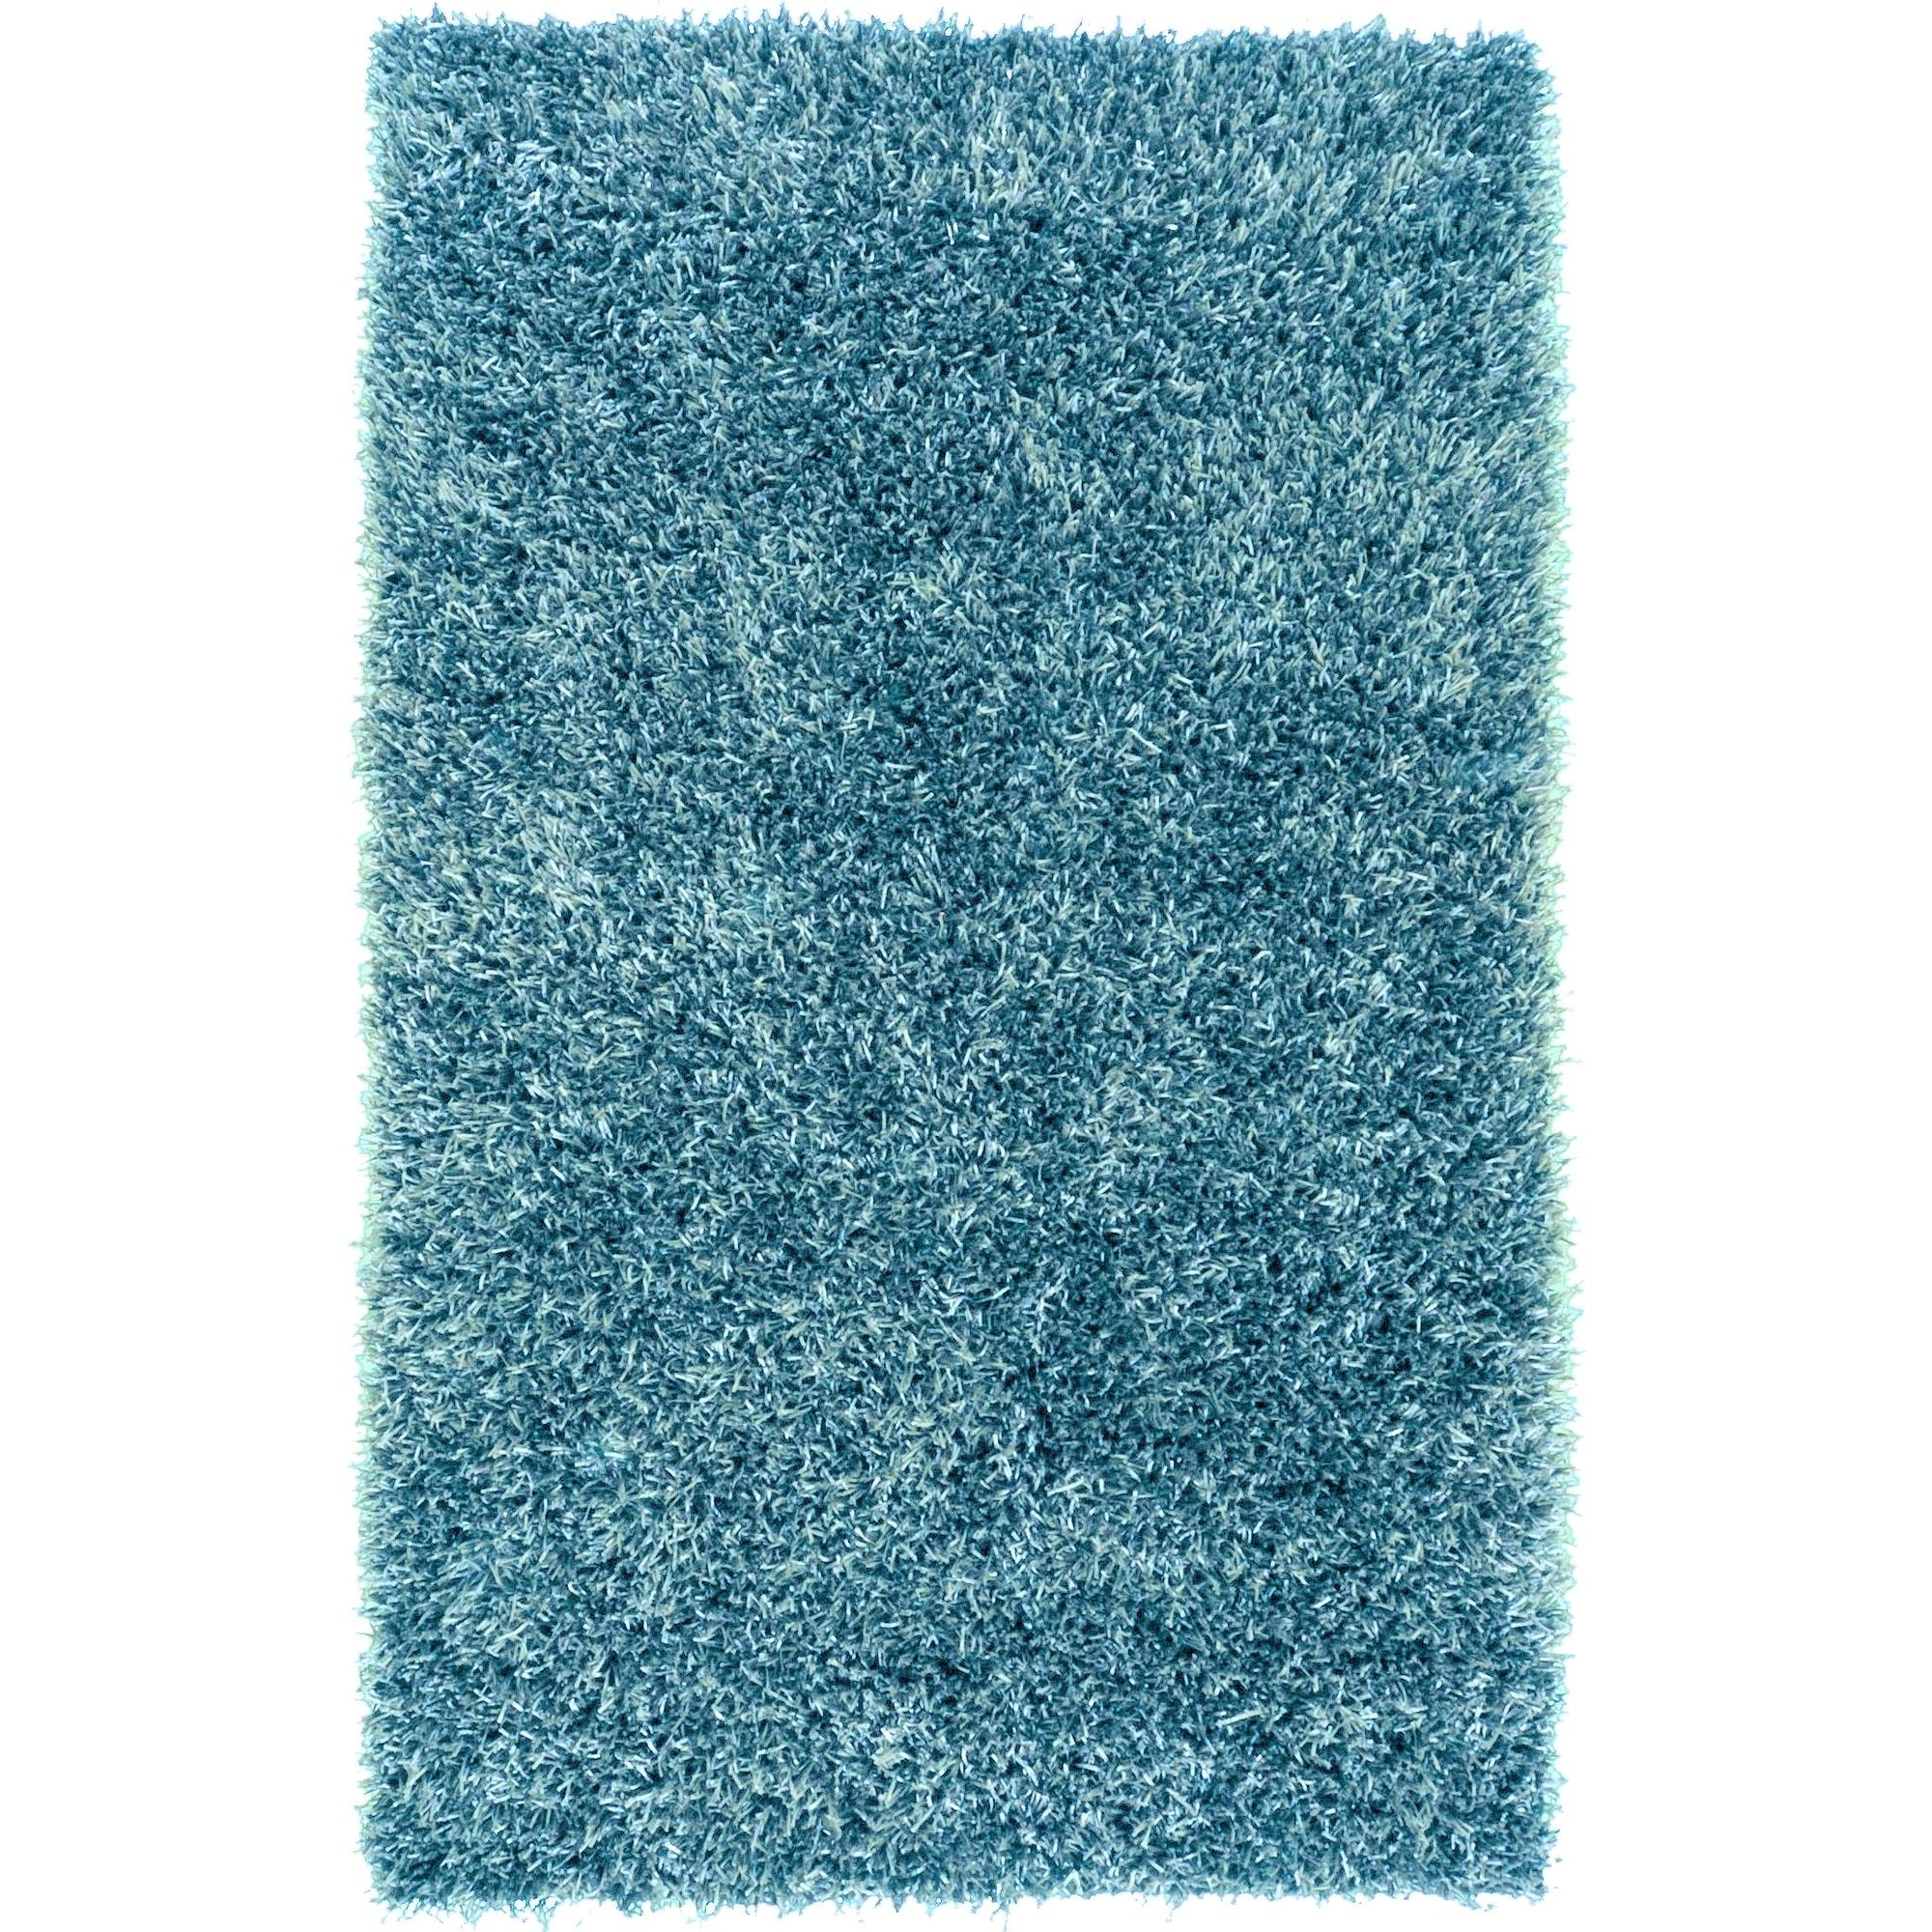 Shop Hand-woven Teal Blue Milwaukee Soft Plush Shag Area Rug - 8\' x ...